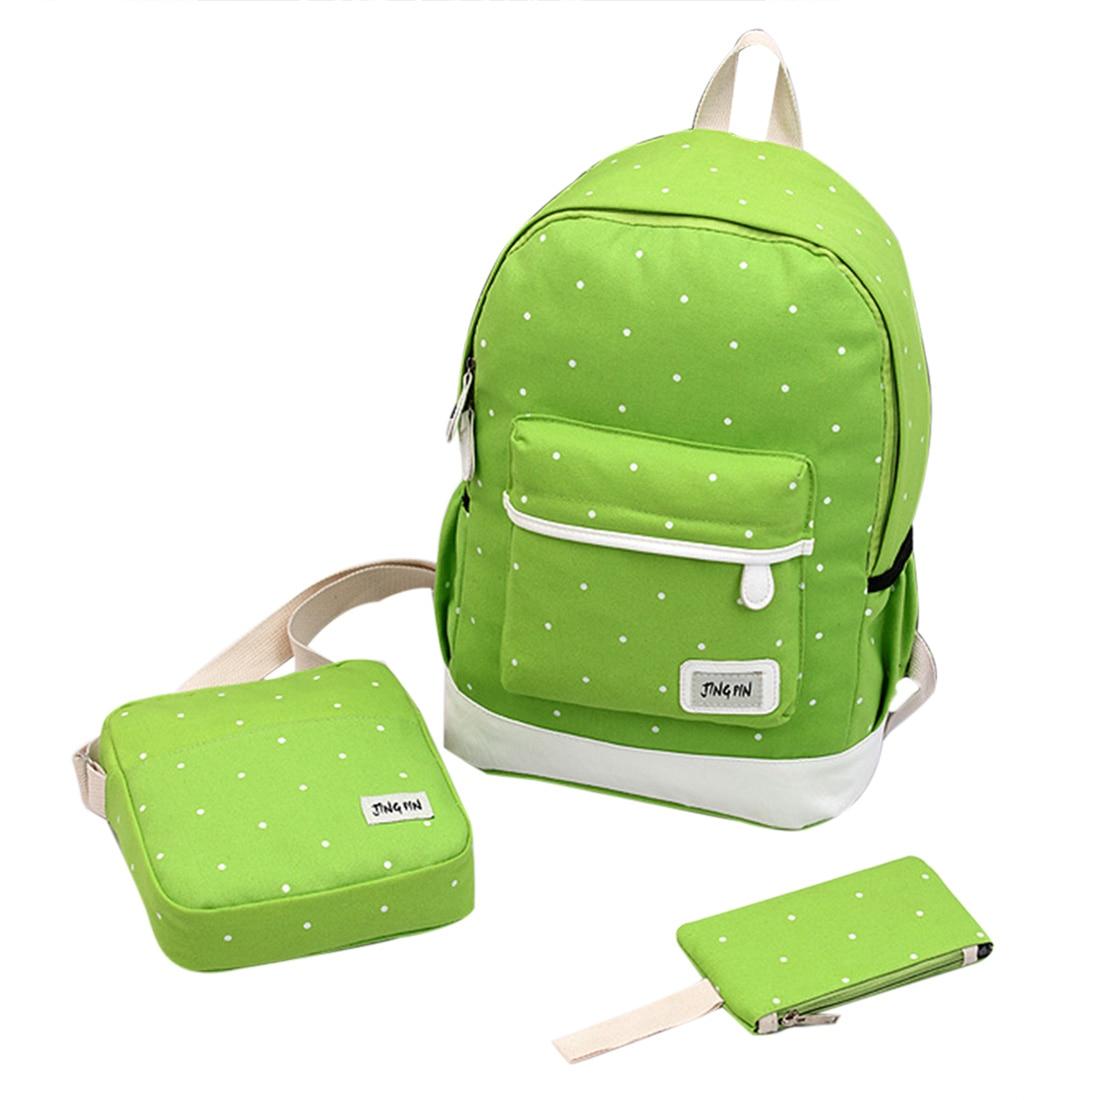 Puimentiua School-Bag Canvas Backpack Water-Proof Student Unisex 1set New 3pcs